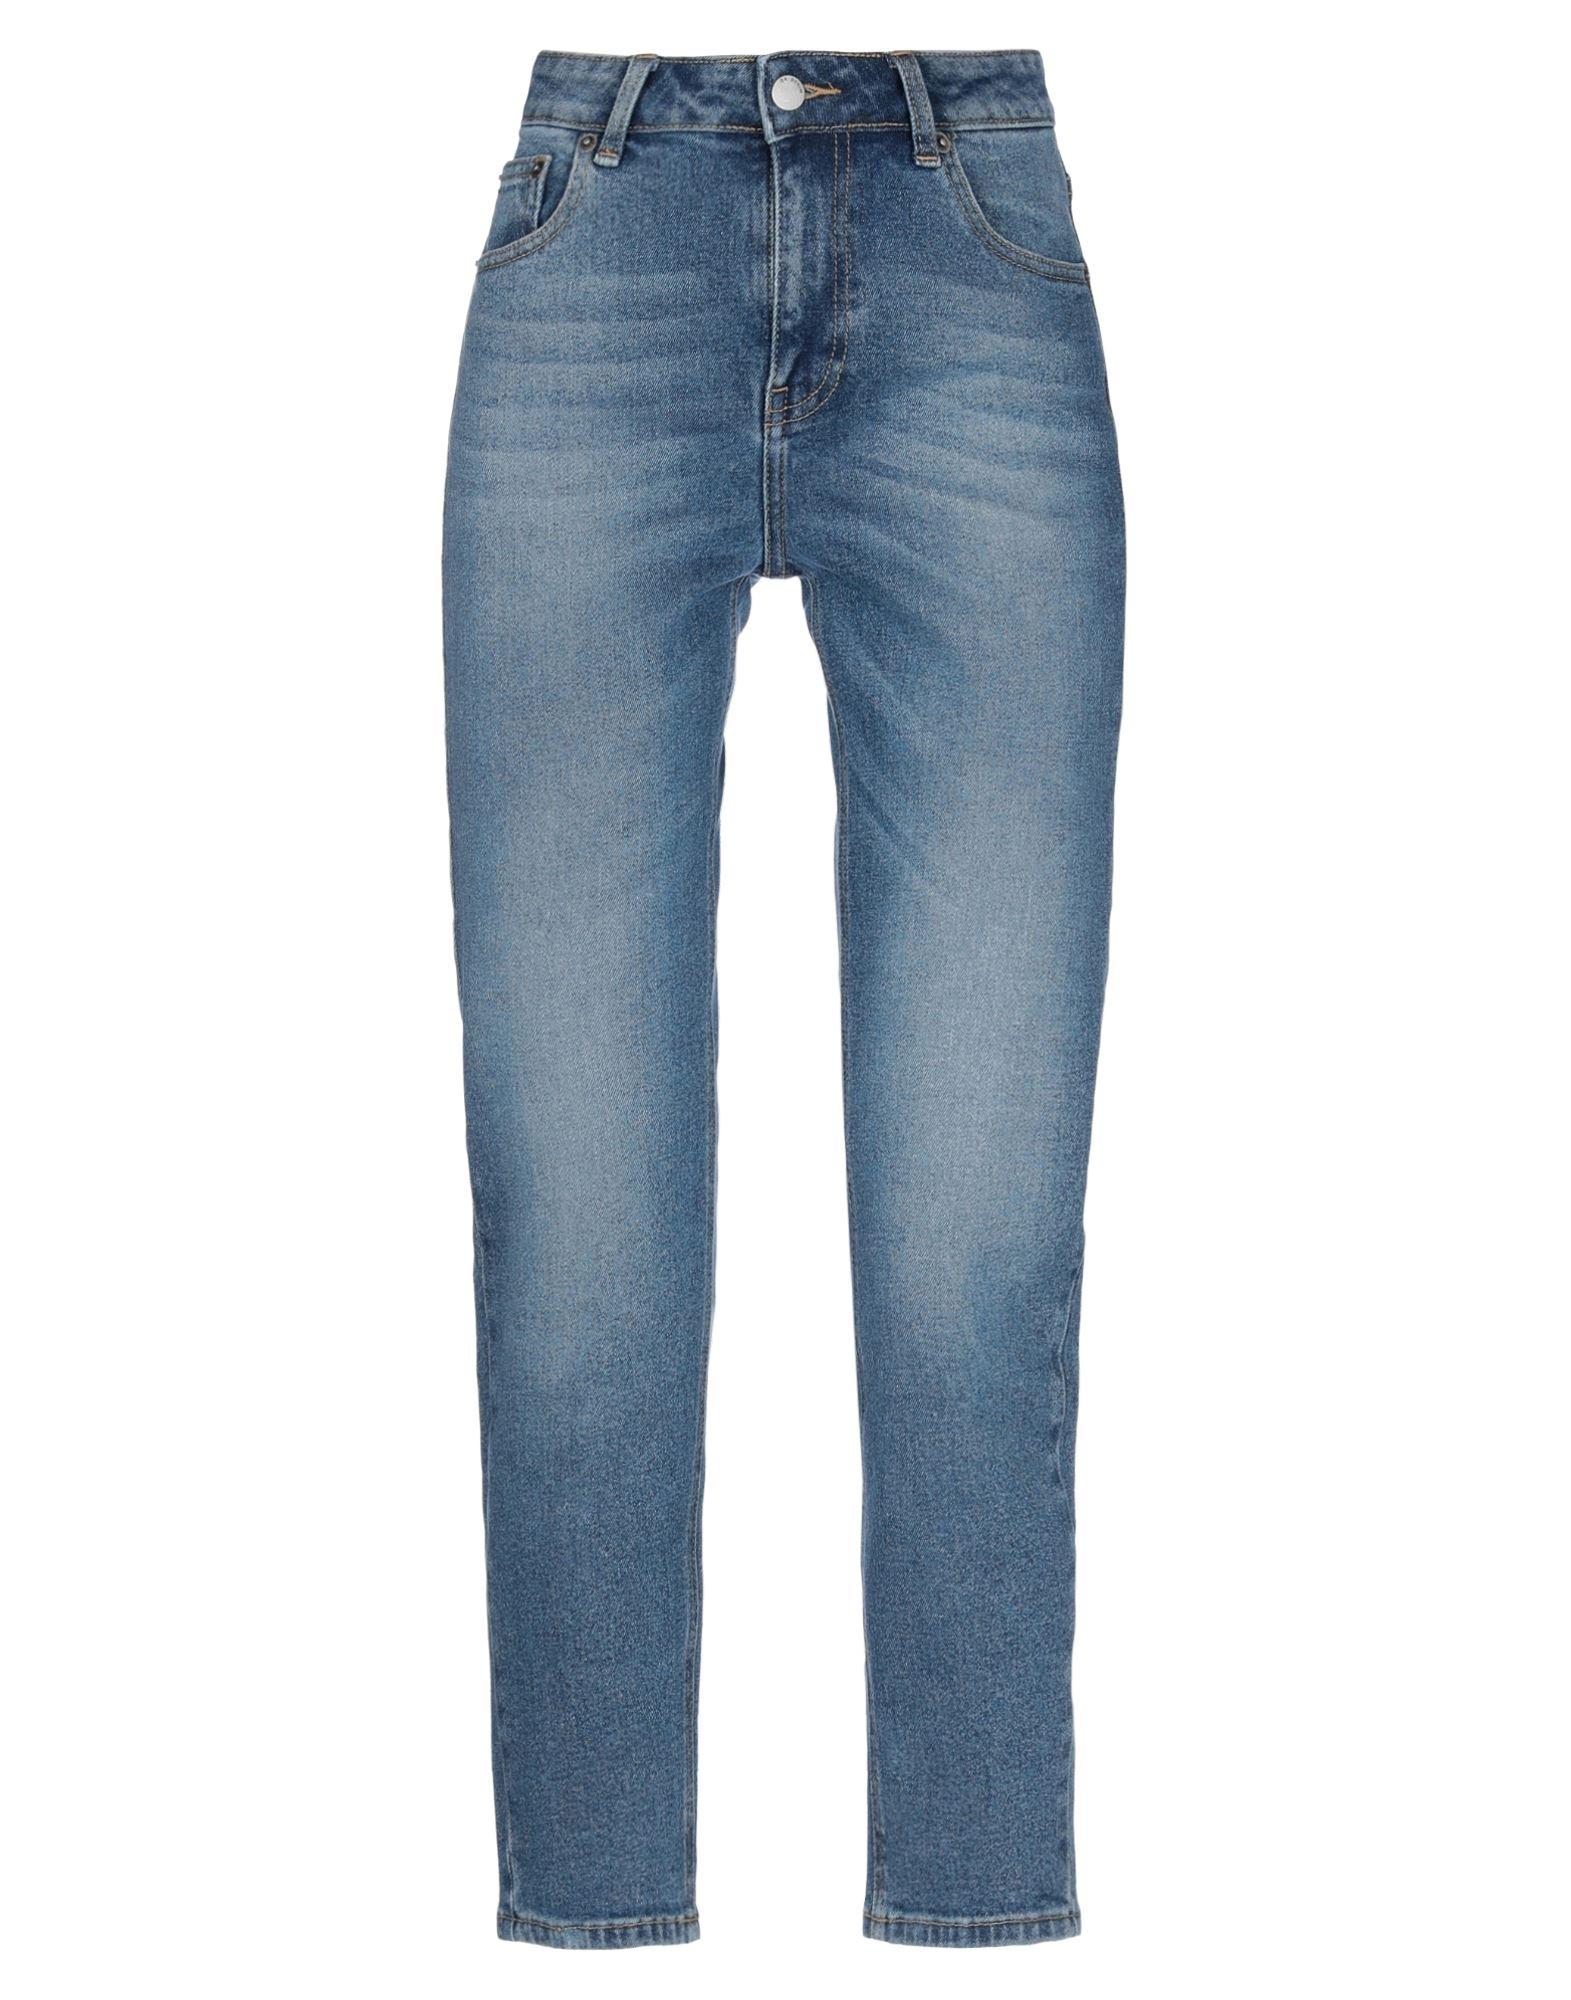 DR. DENIM JEANSMAKERS Джинсовые брюки dr denim jeansmakers джинсовые брюки